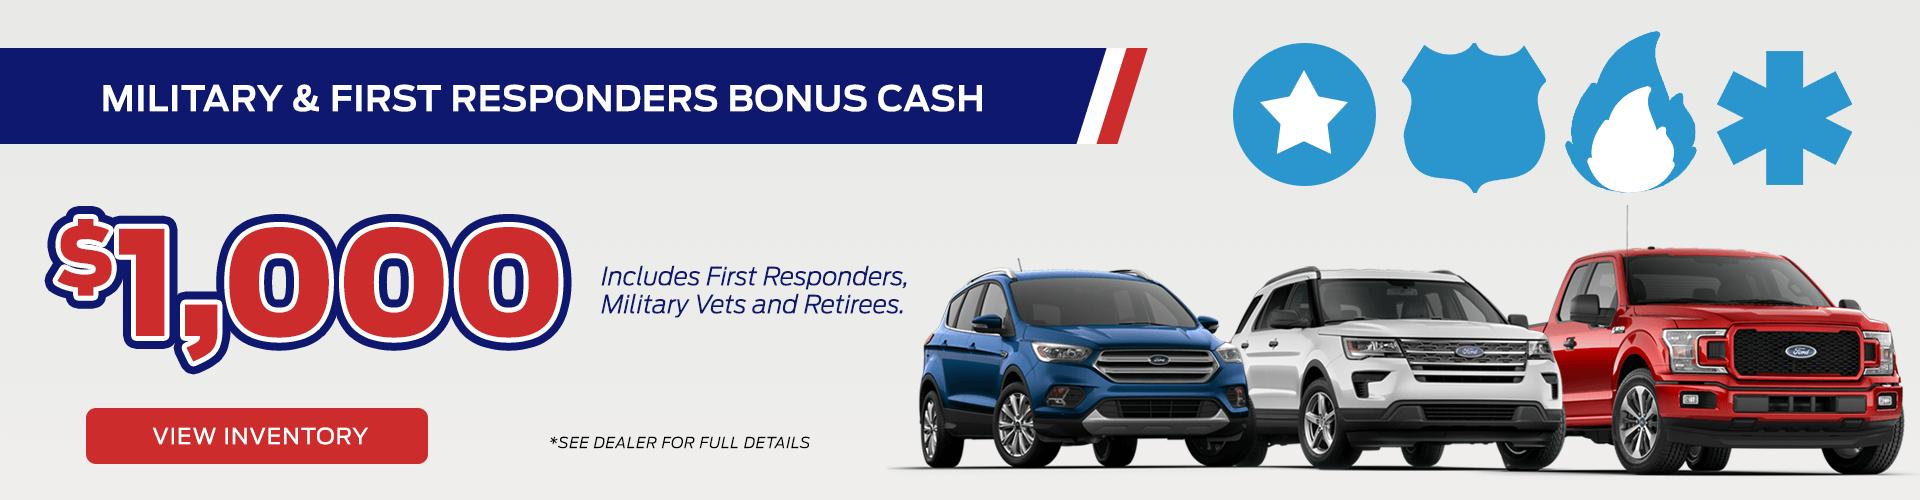 Military & First Responders Bonus Cash